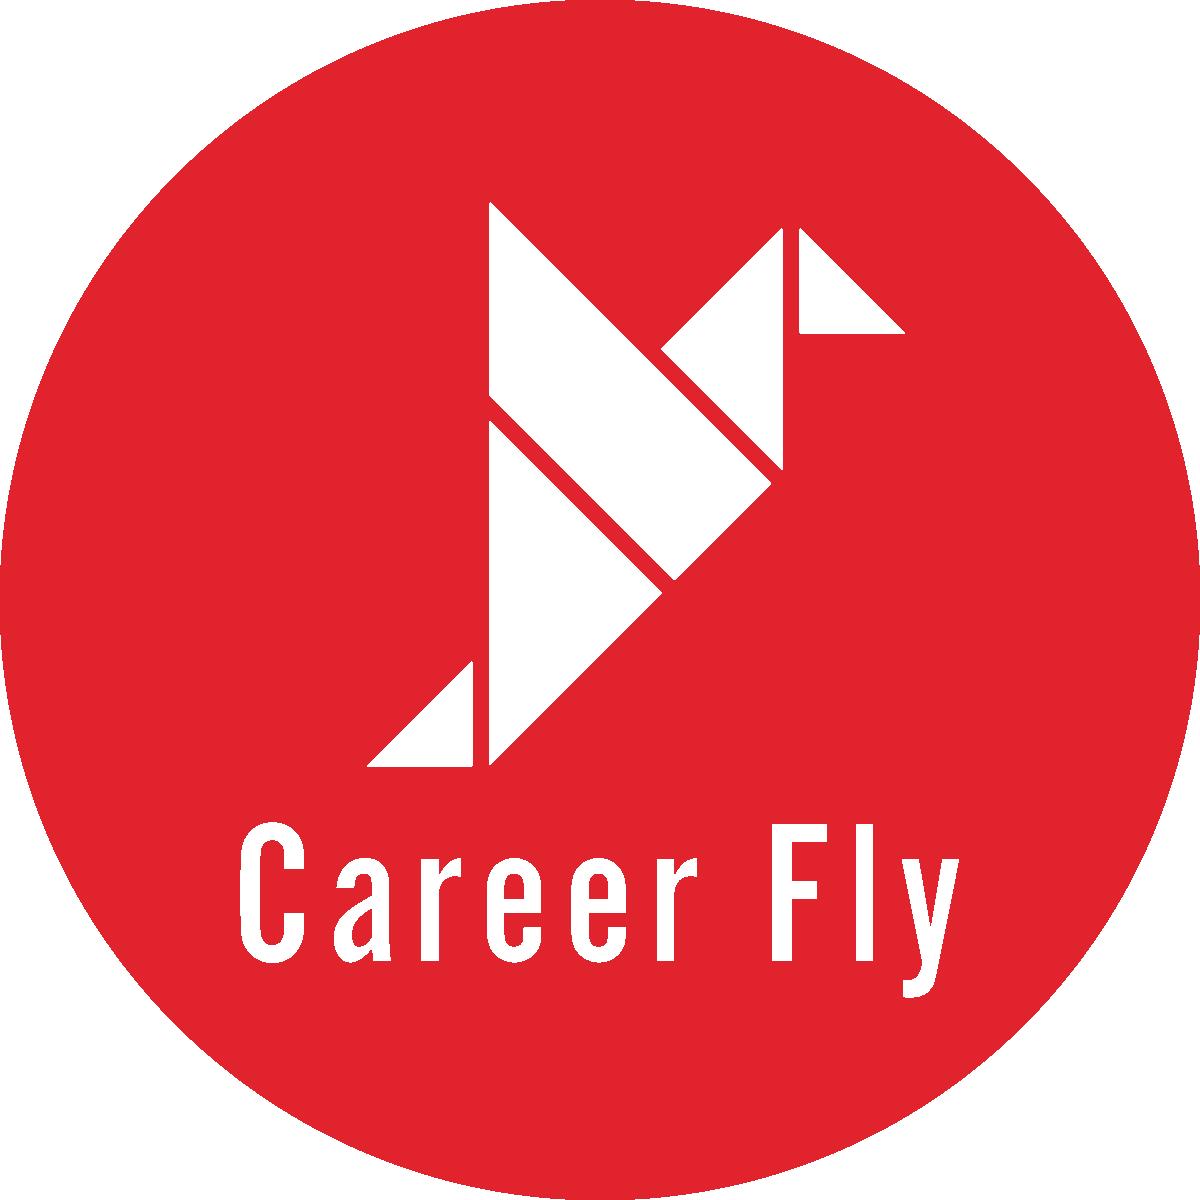 Career Fly 株式会社 様